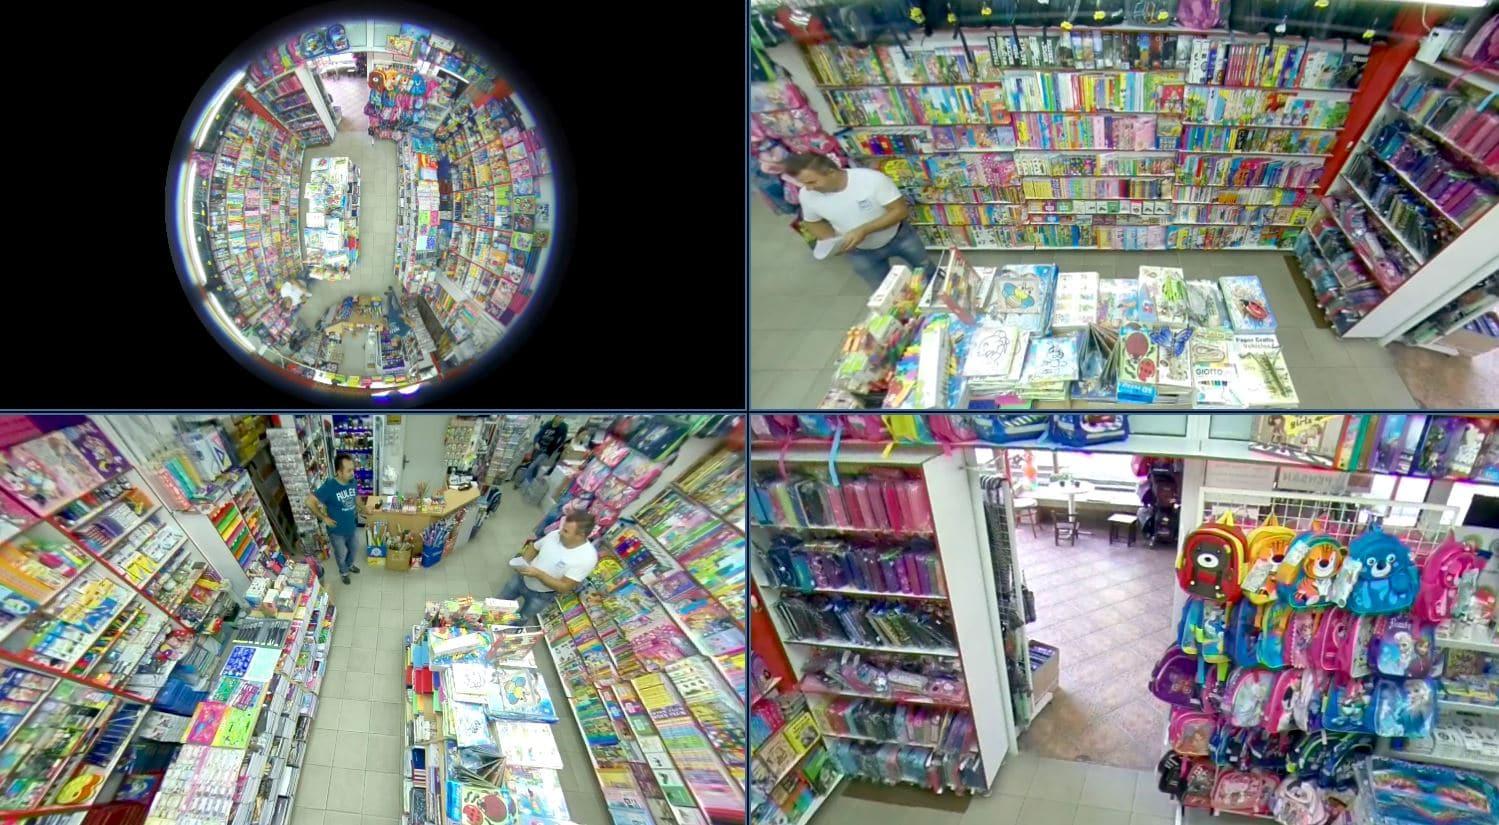 FishEye Überwachungskamera